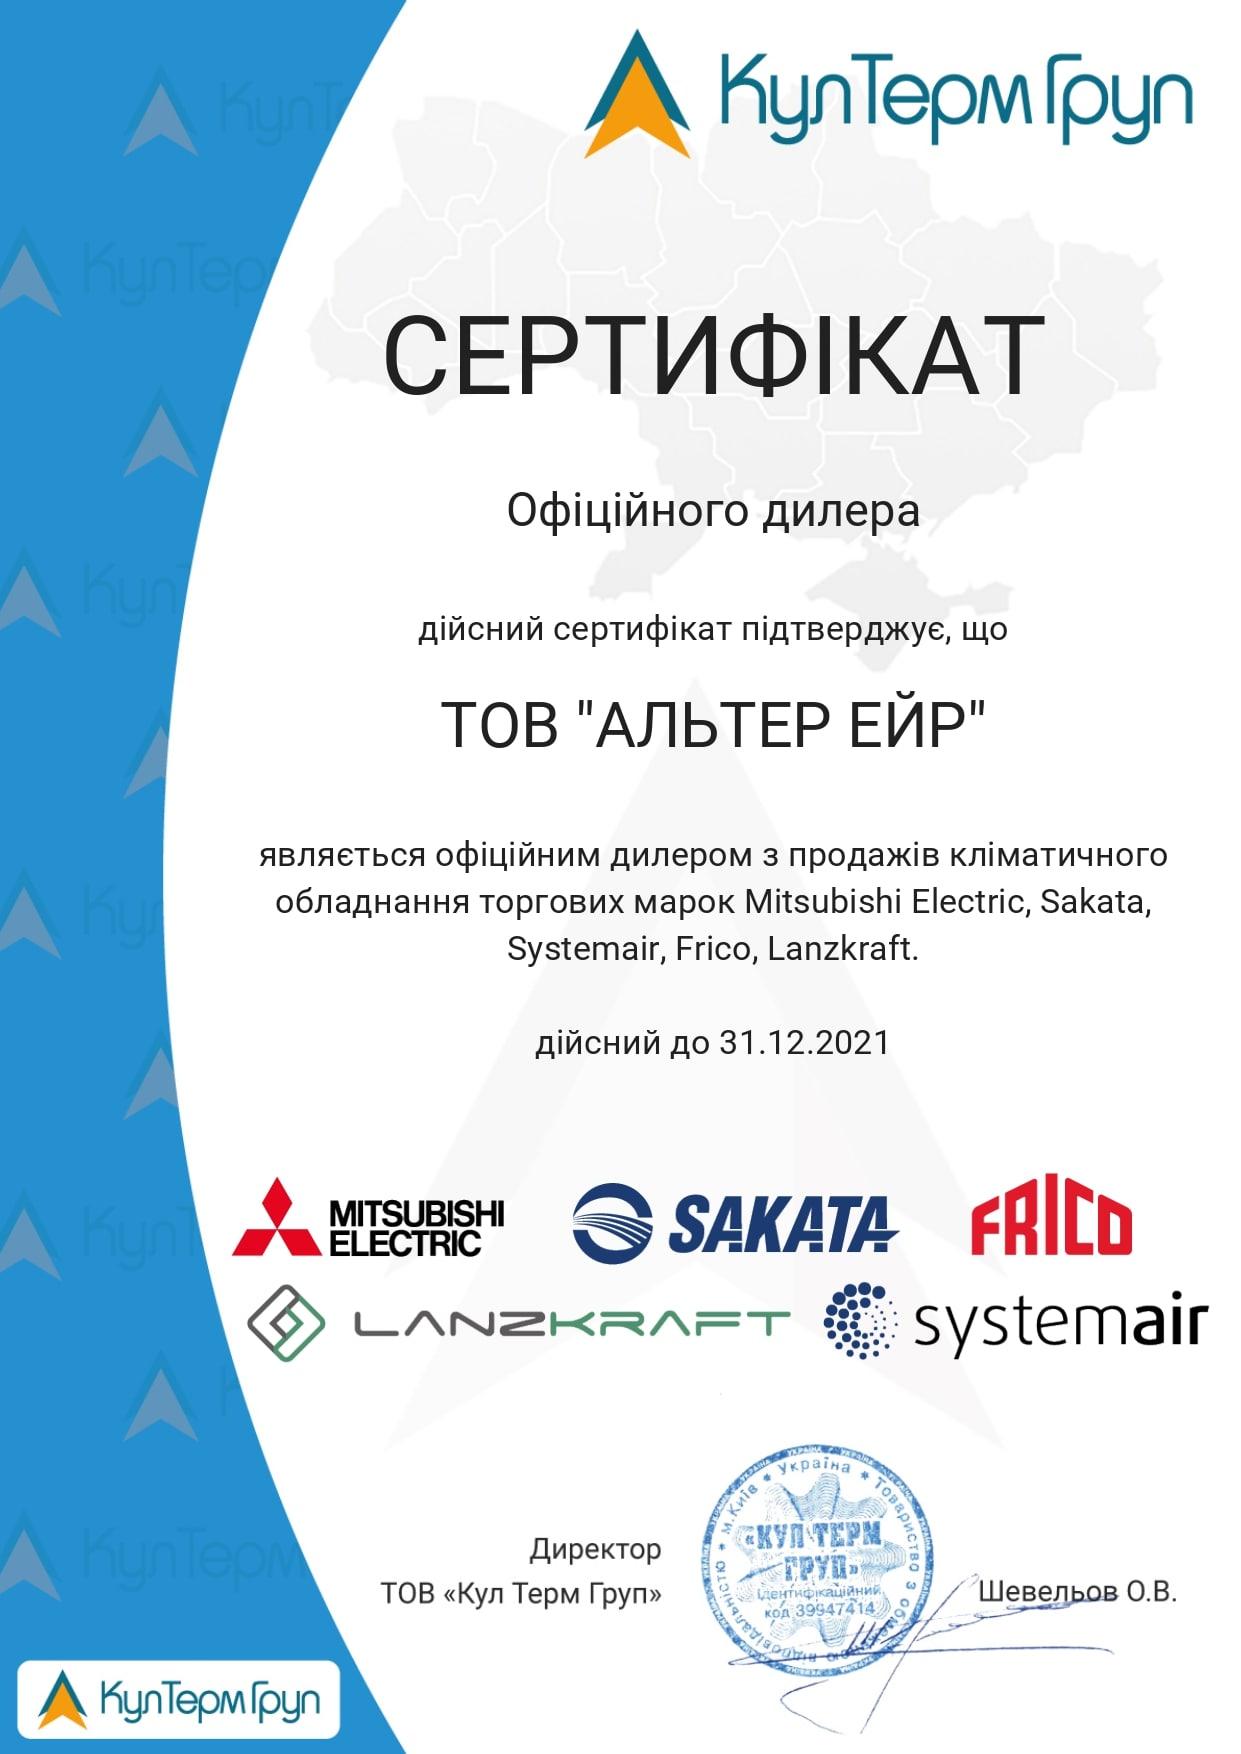 Сертификат официального дилера ME, Sakata, Systemair, Frico